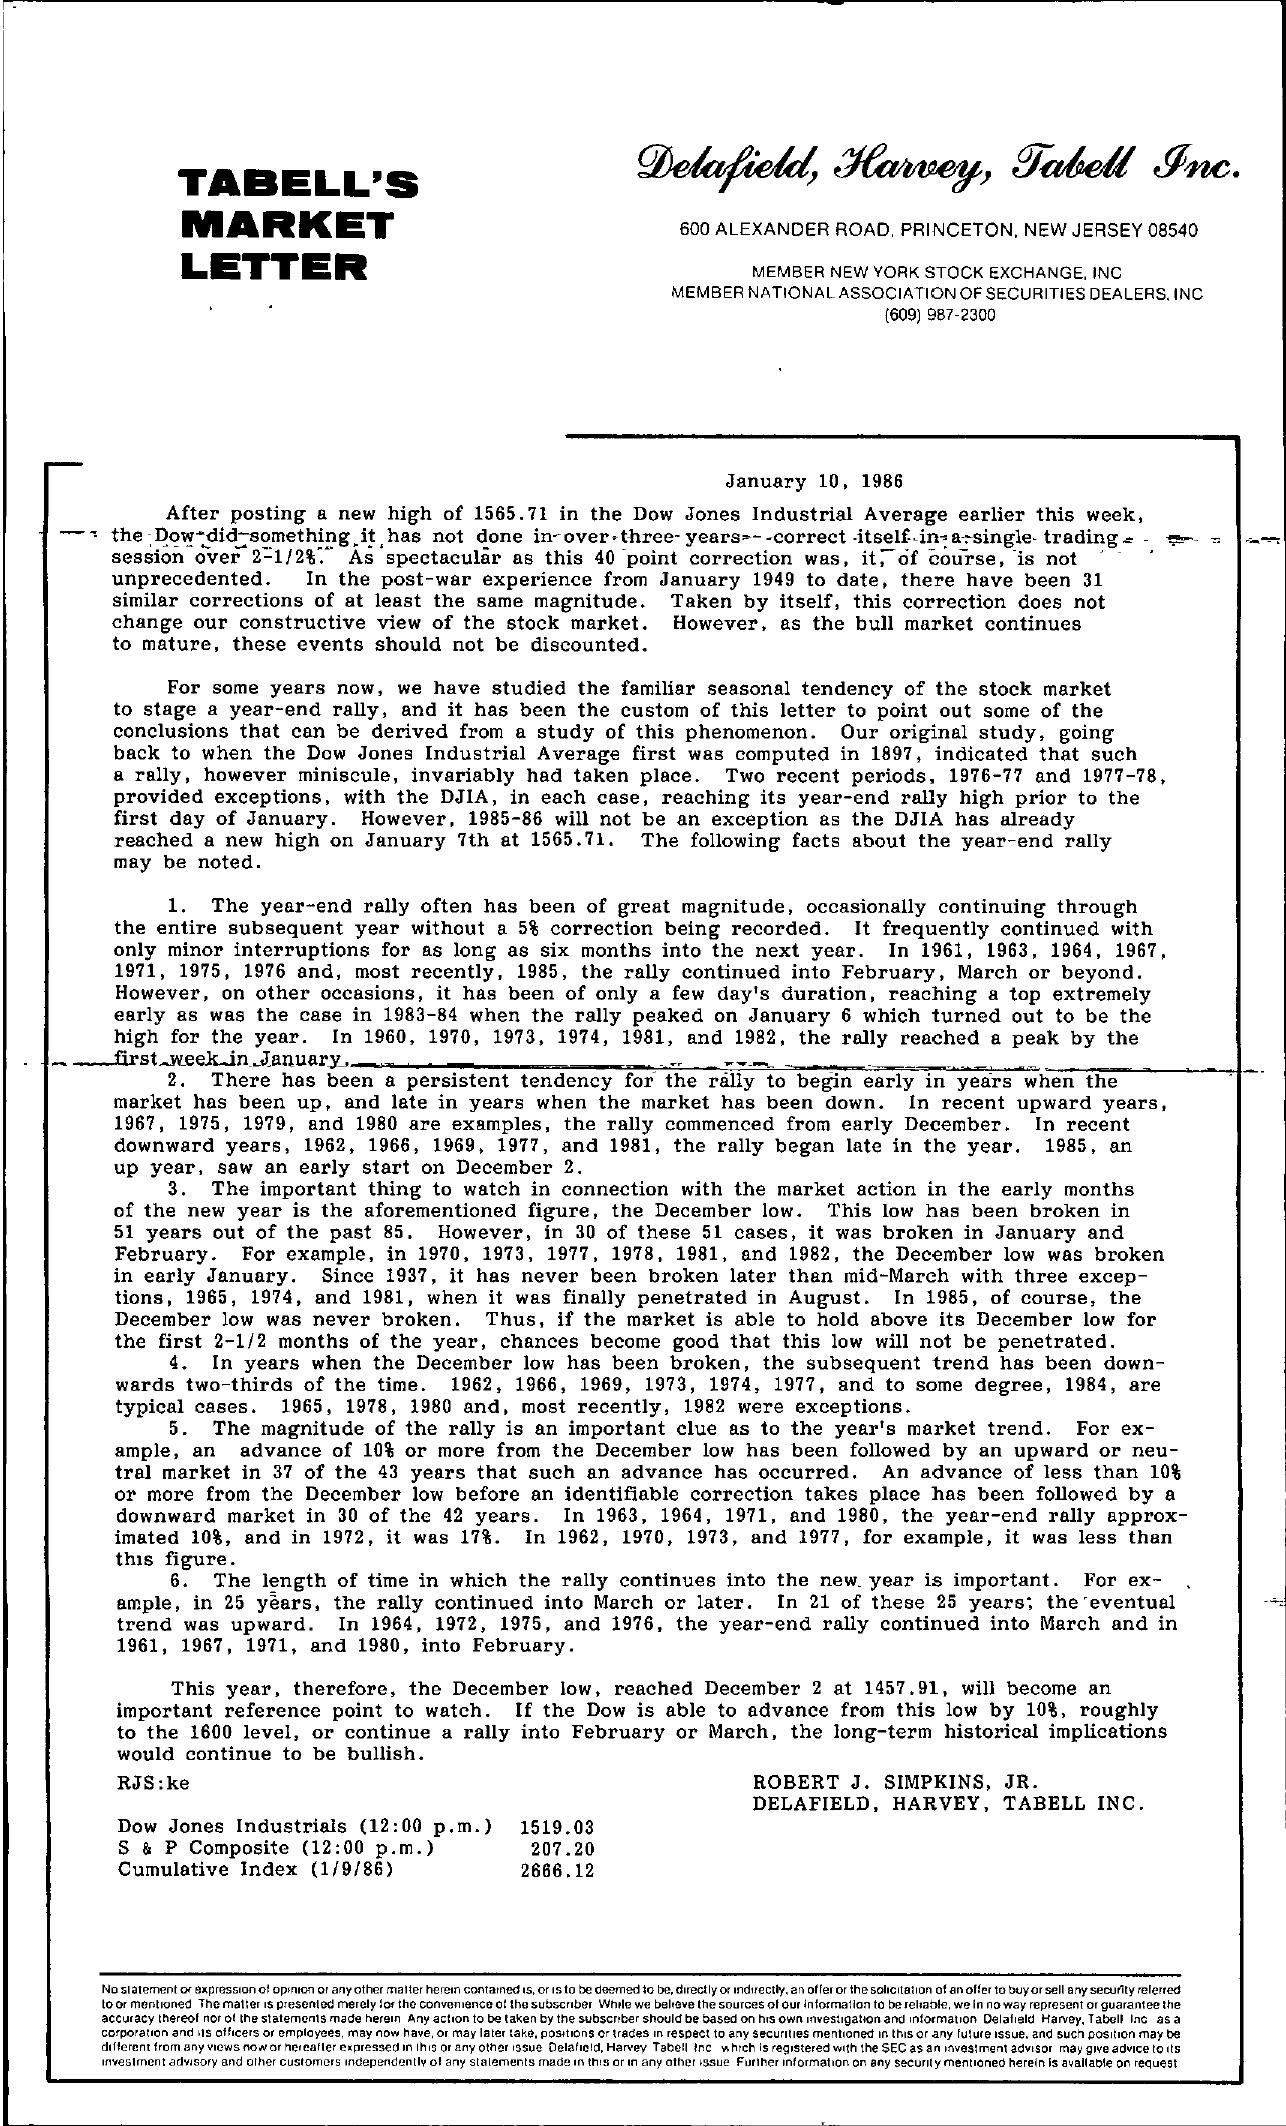 Tabell's Market Letter - January 10, 1986